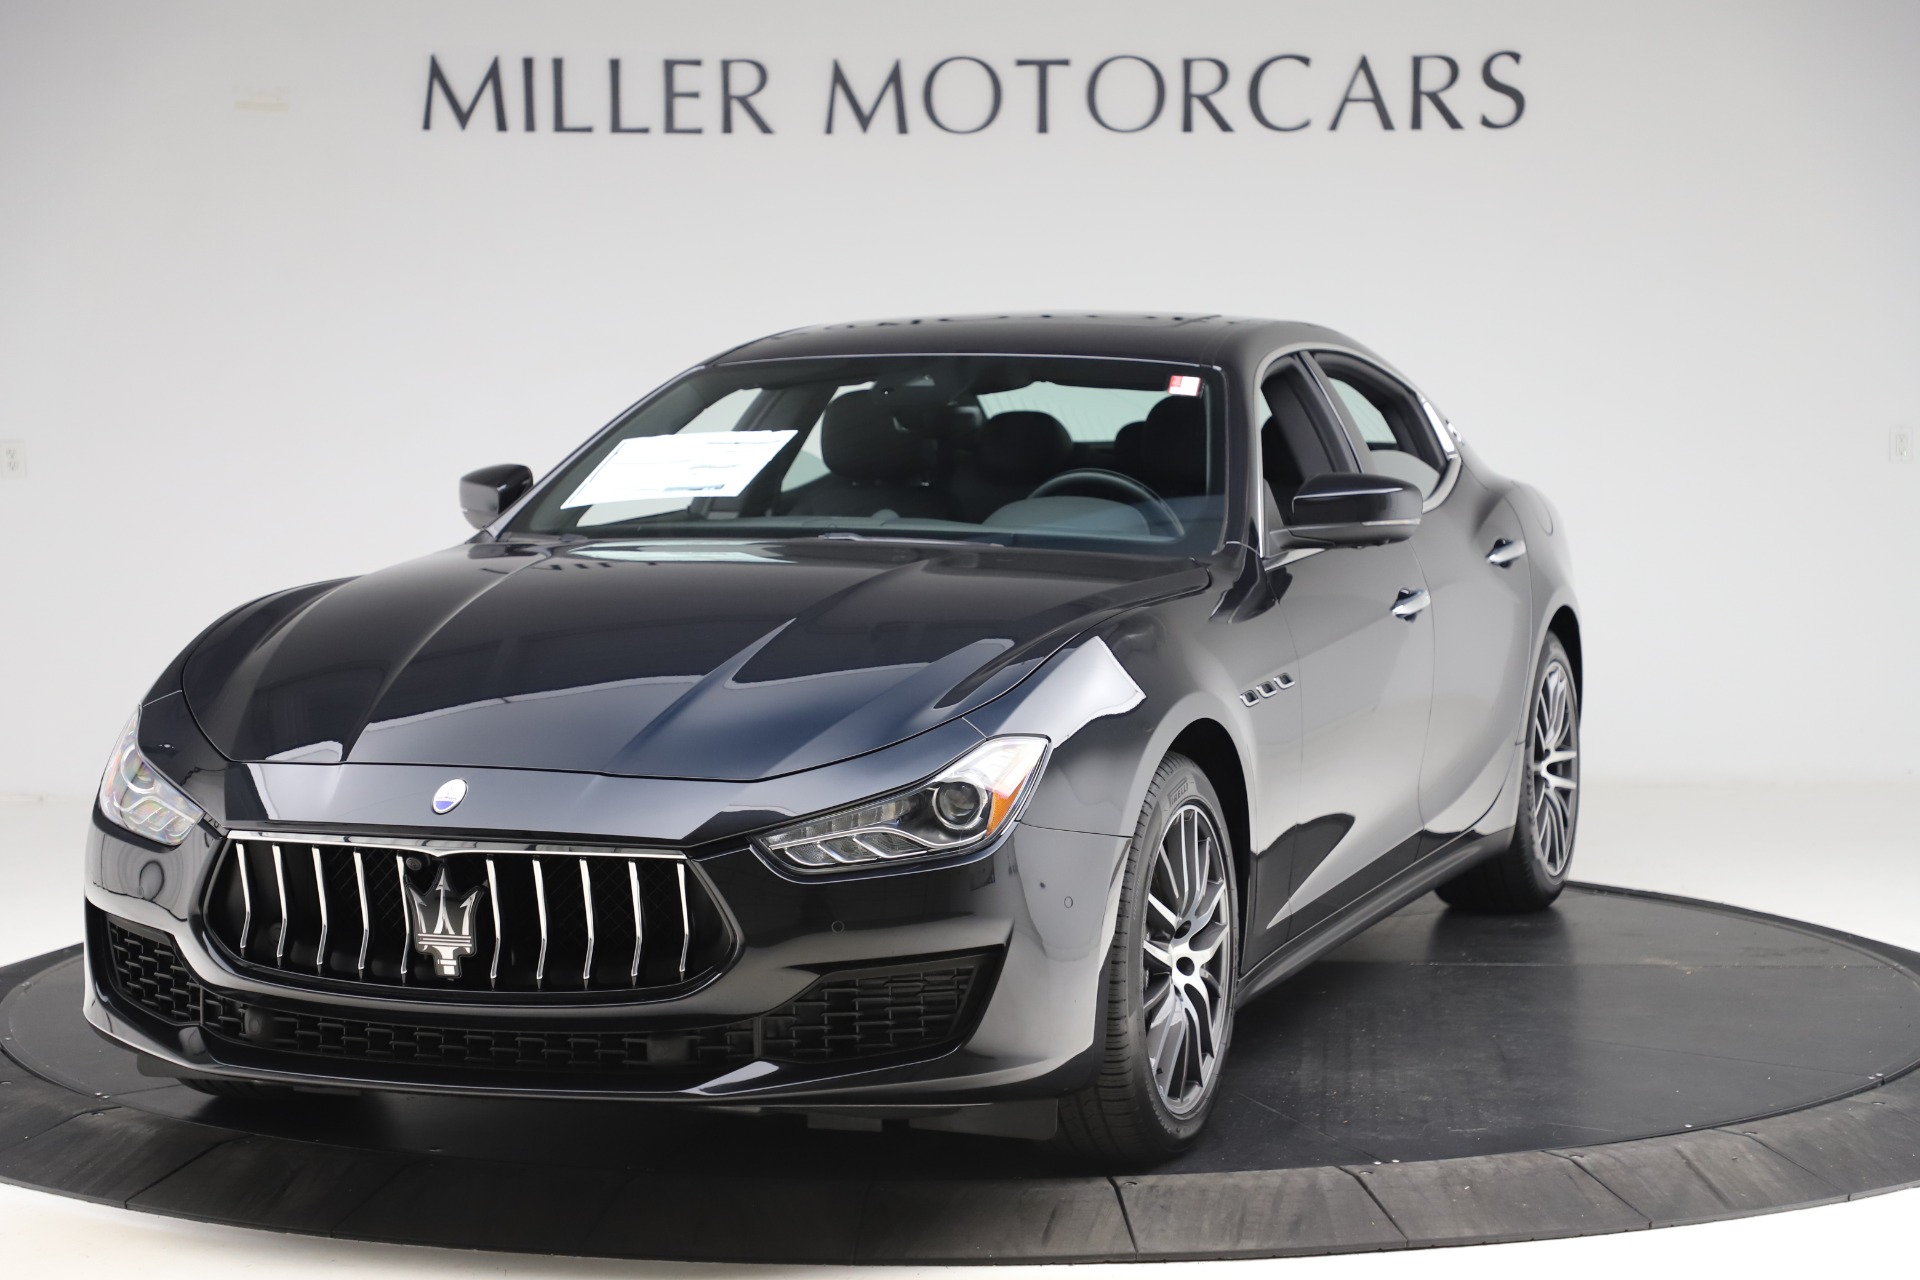 New 2019 Maserati Ghibli S Q4 for sale $91,165 at McLaren Greenwich in Greenwich CT 06830 1